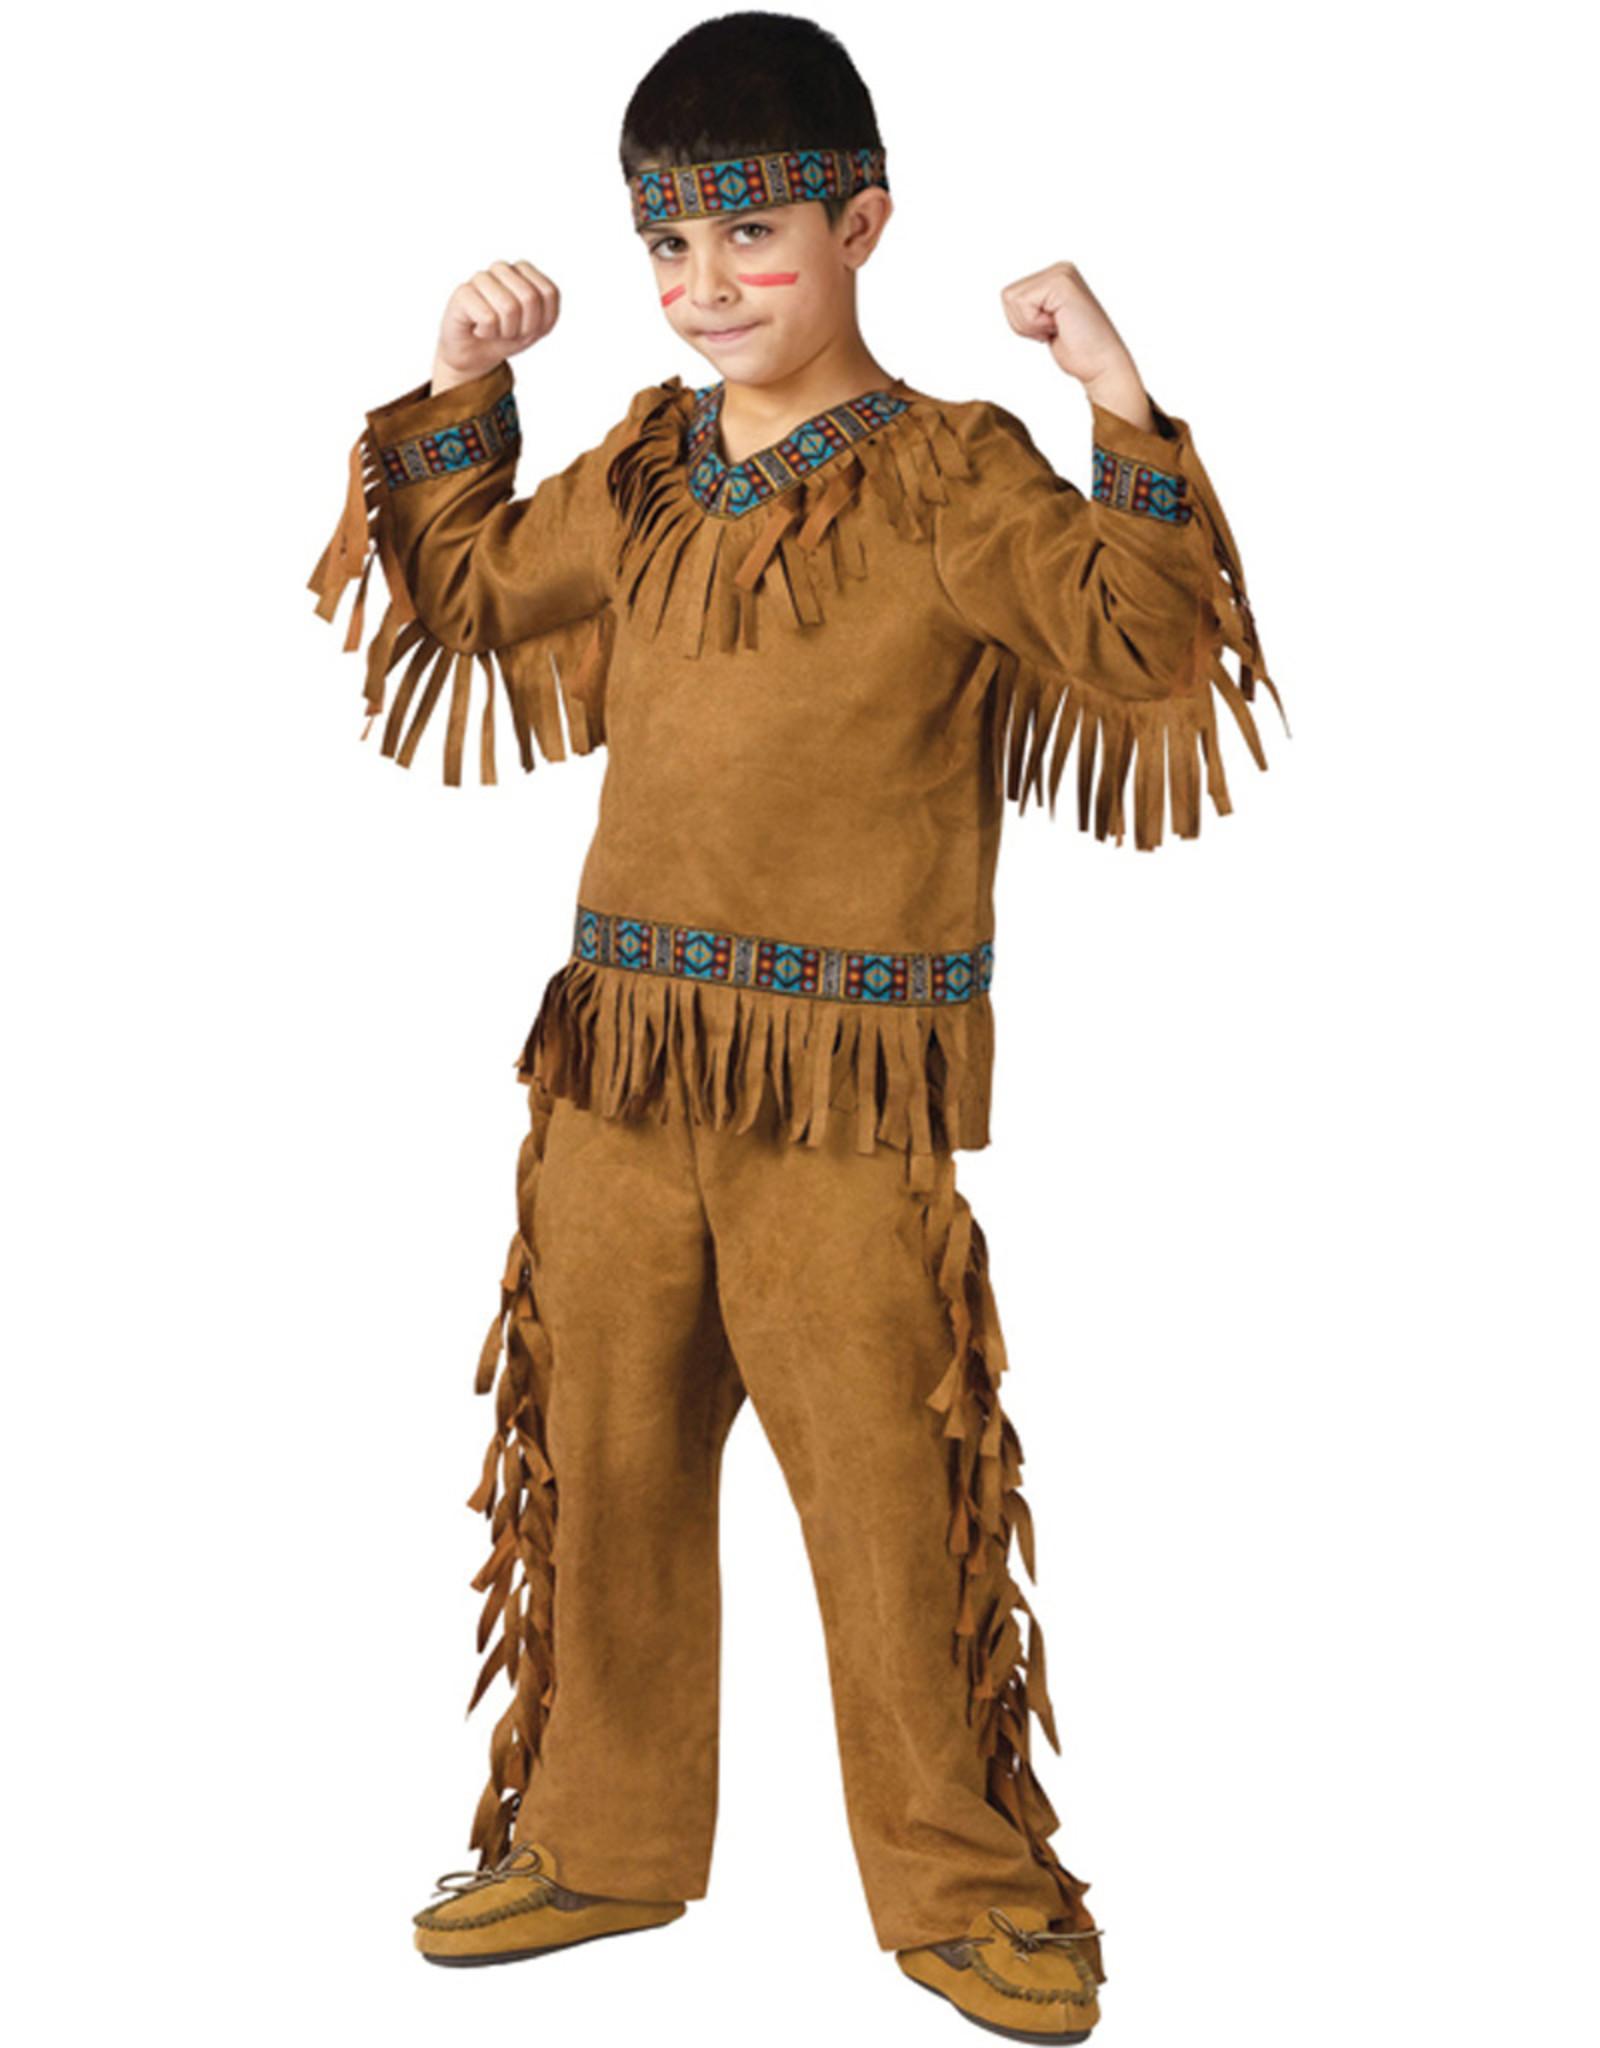 Native American Indian Costume - Boy's